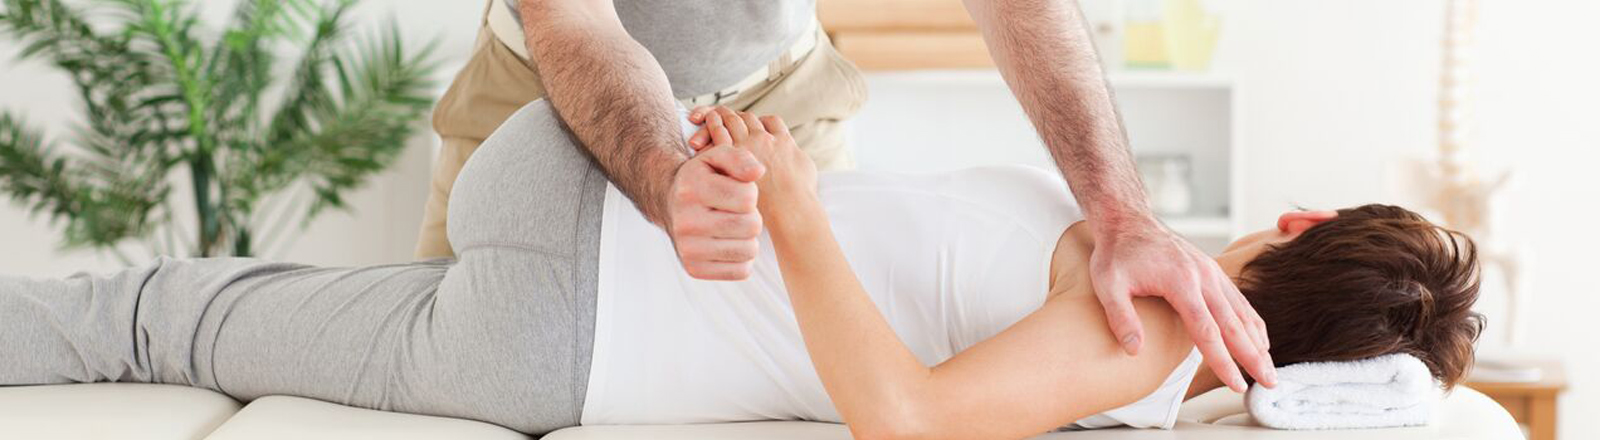 osteopatia deportiva bilbao